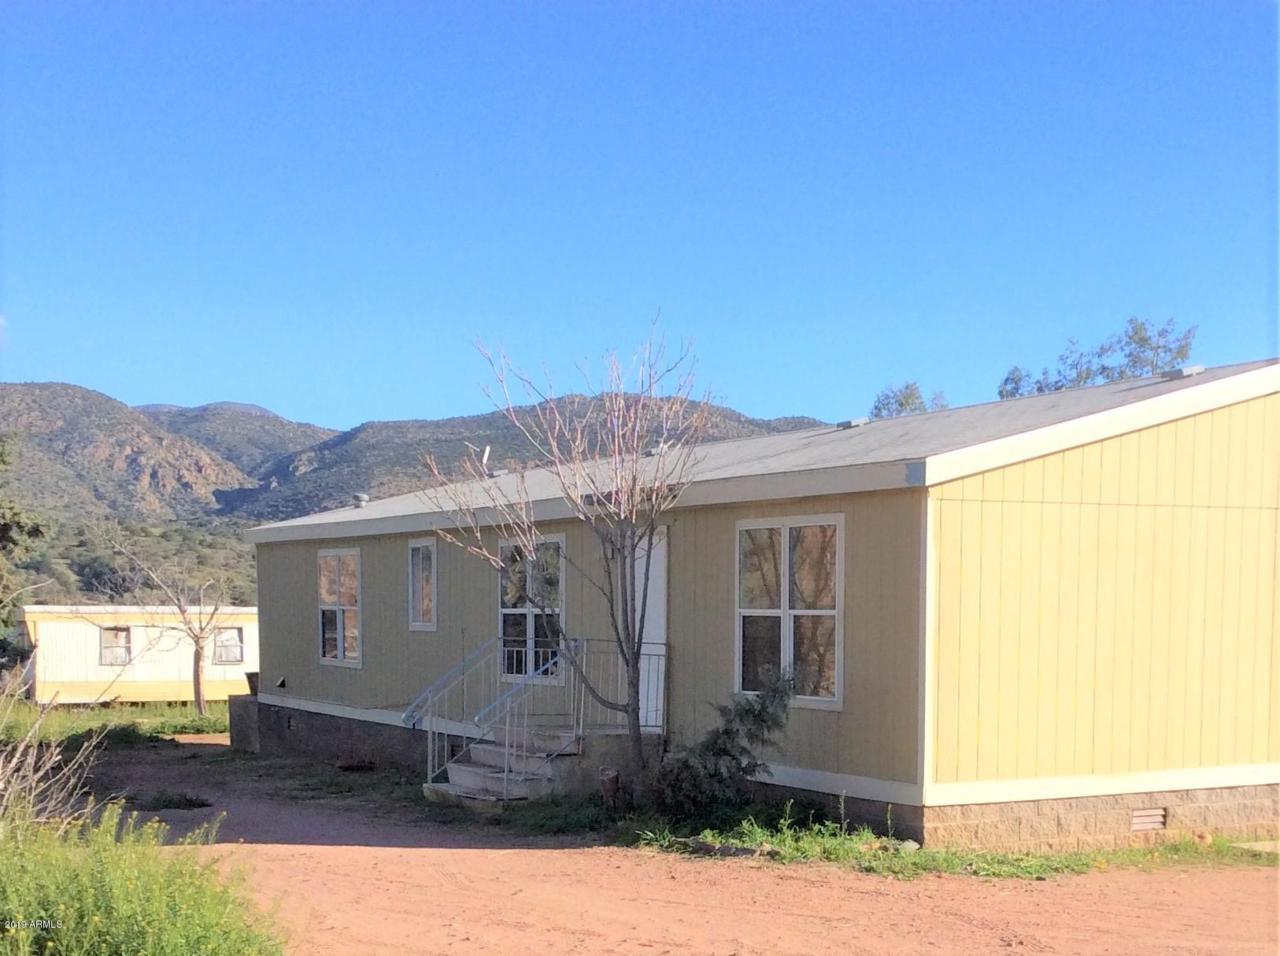 448 Tonto Creek Drive - Photo 1